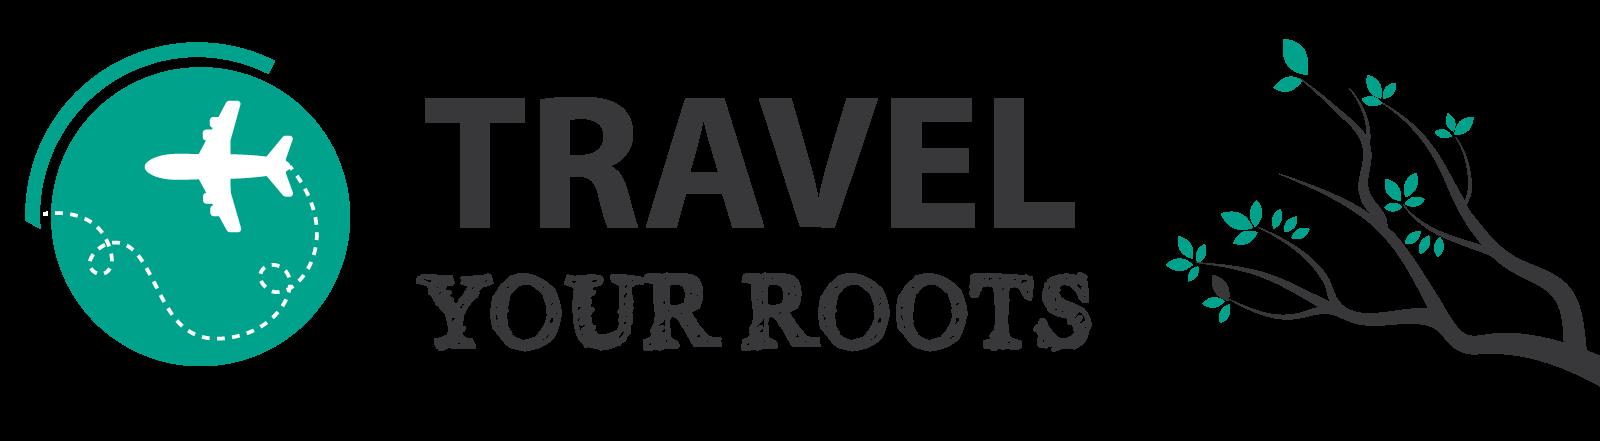 travel service details